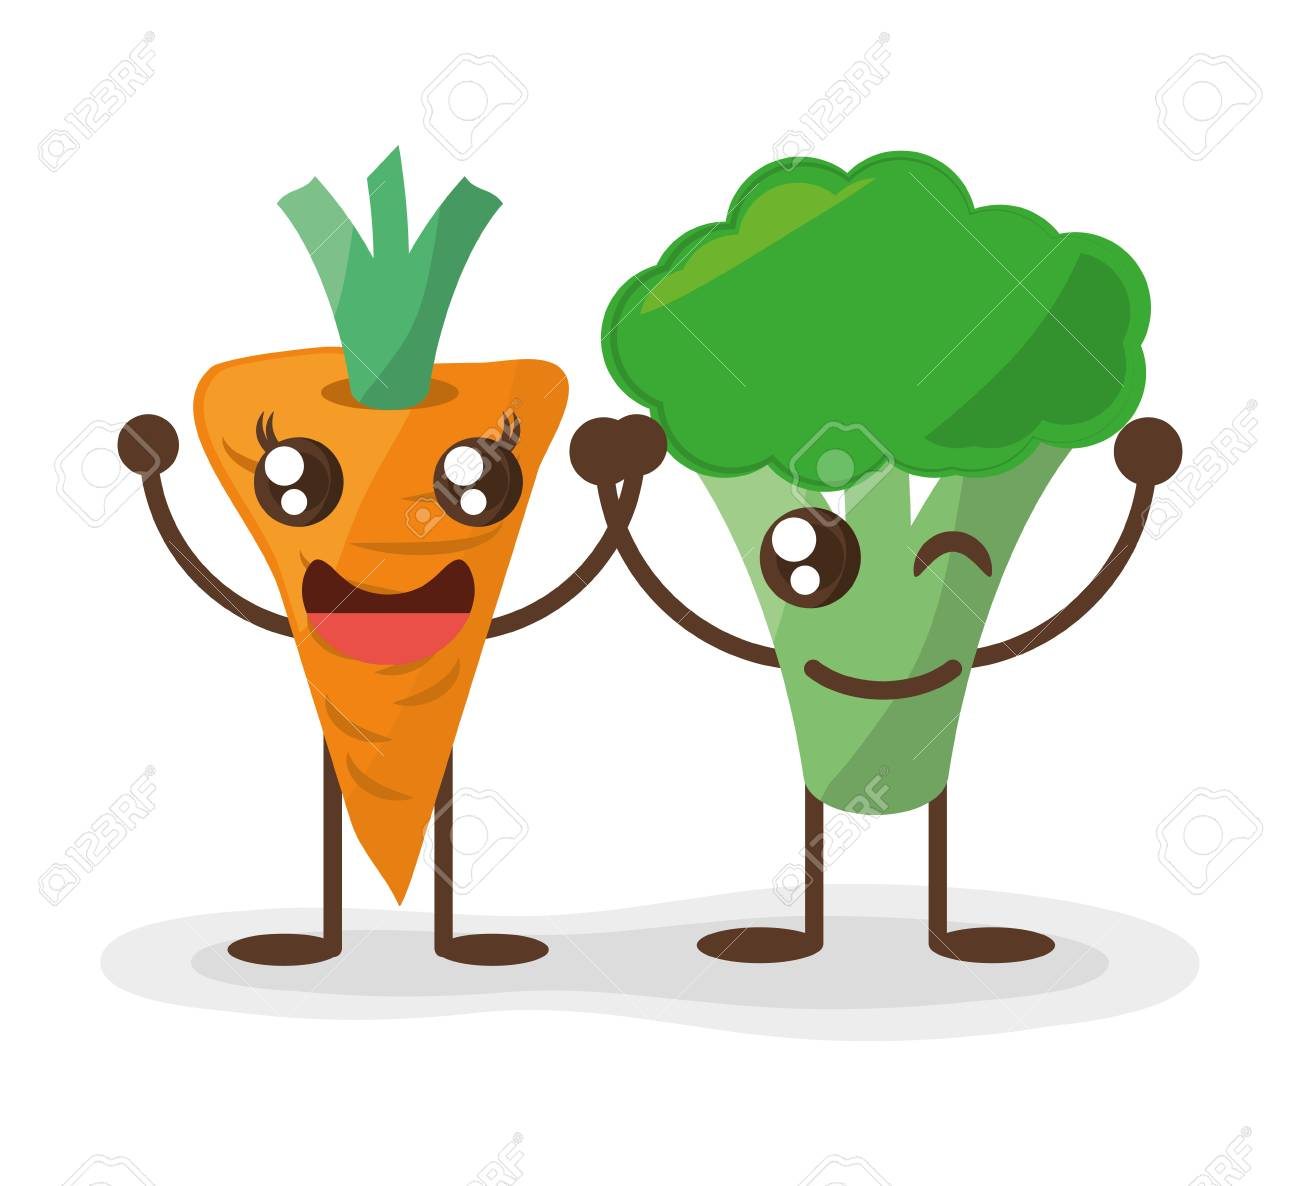 kawaii carrot and broccoli fun food vector illustration eps 10 rh 123rf com food vector background png image food vector background